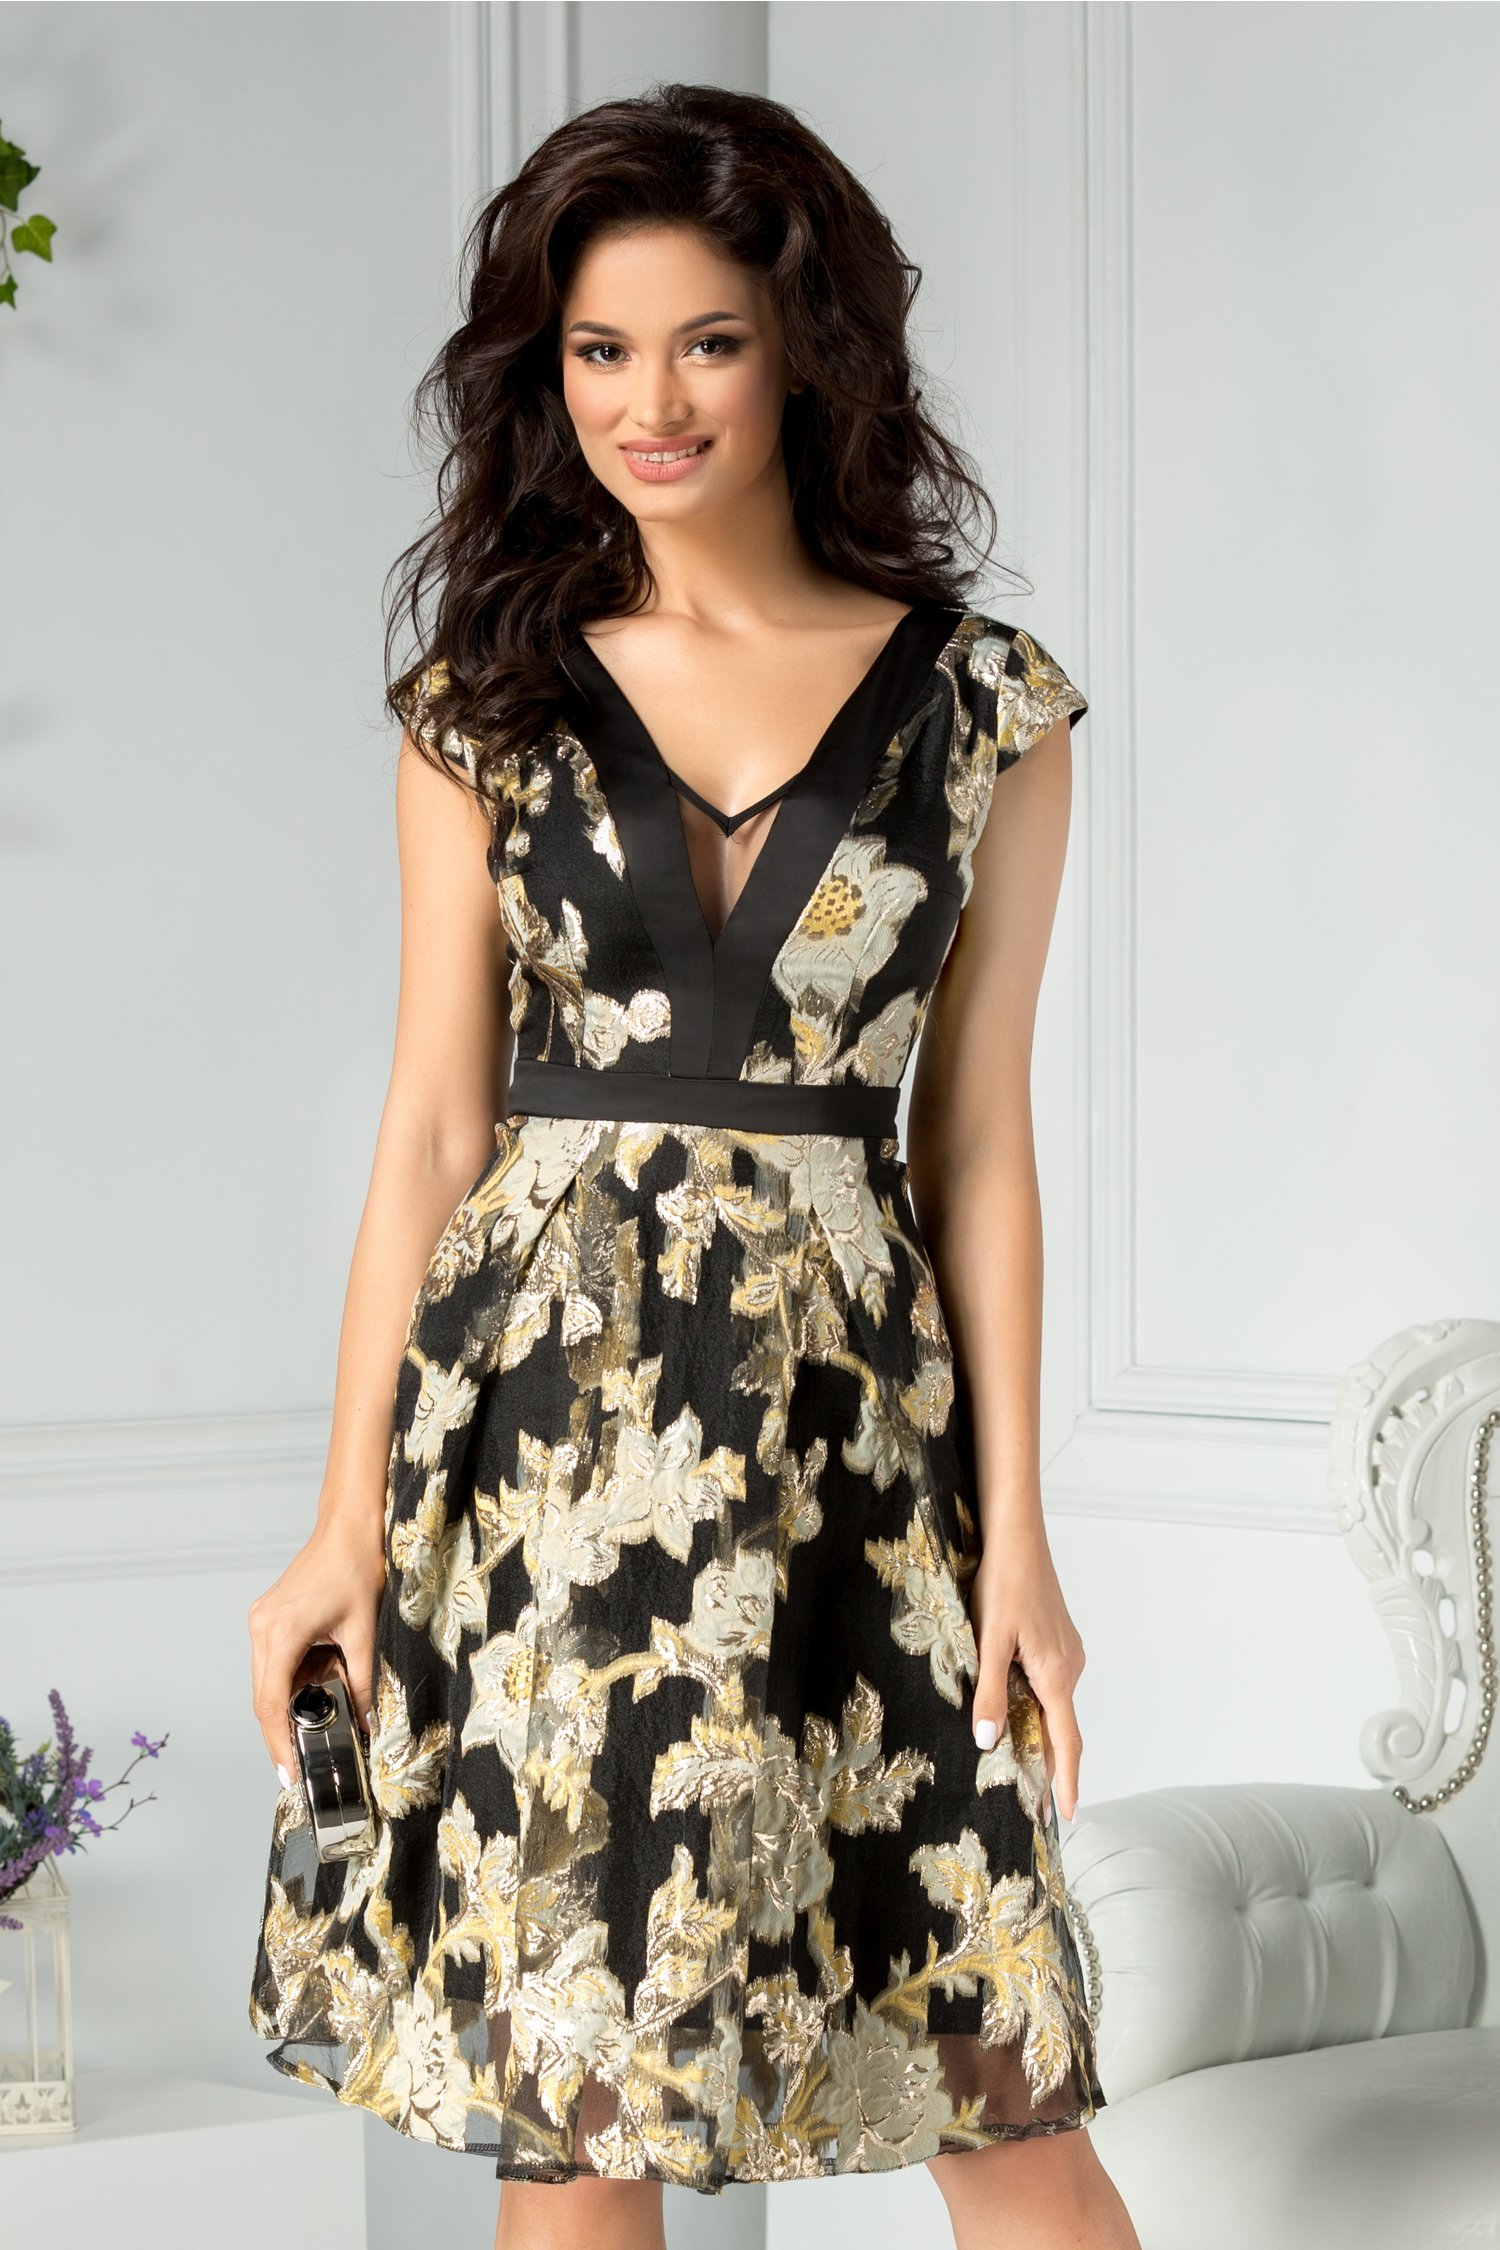 Rochie Moze clos de ocazie neagra cu detalii florale aurii